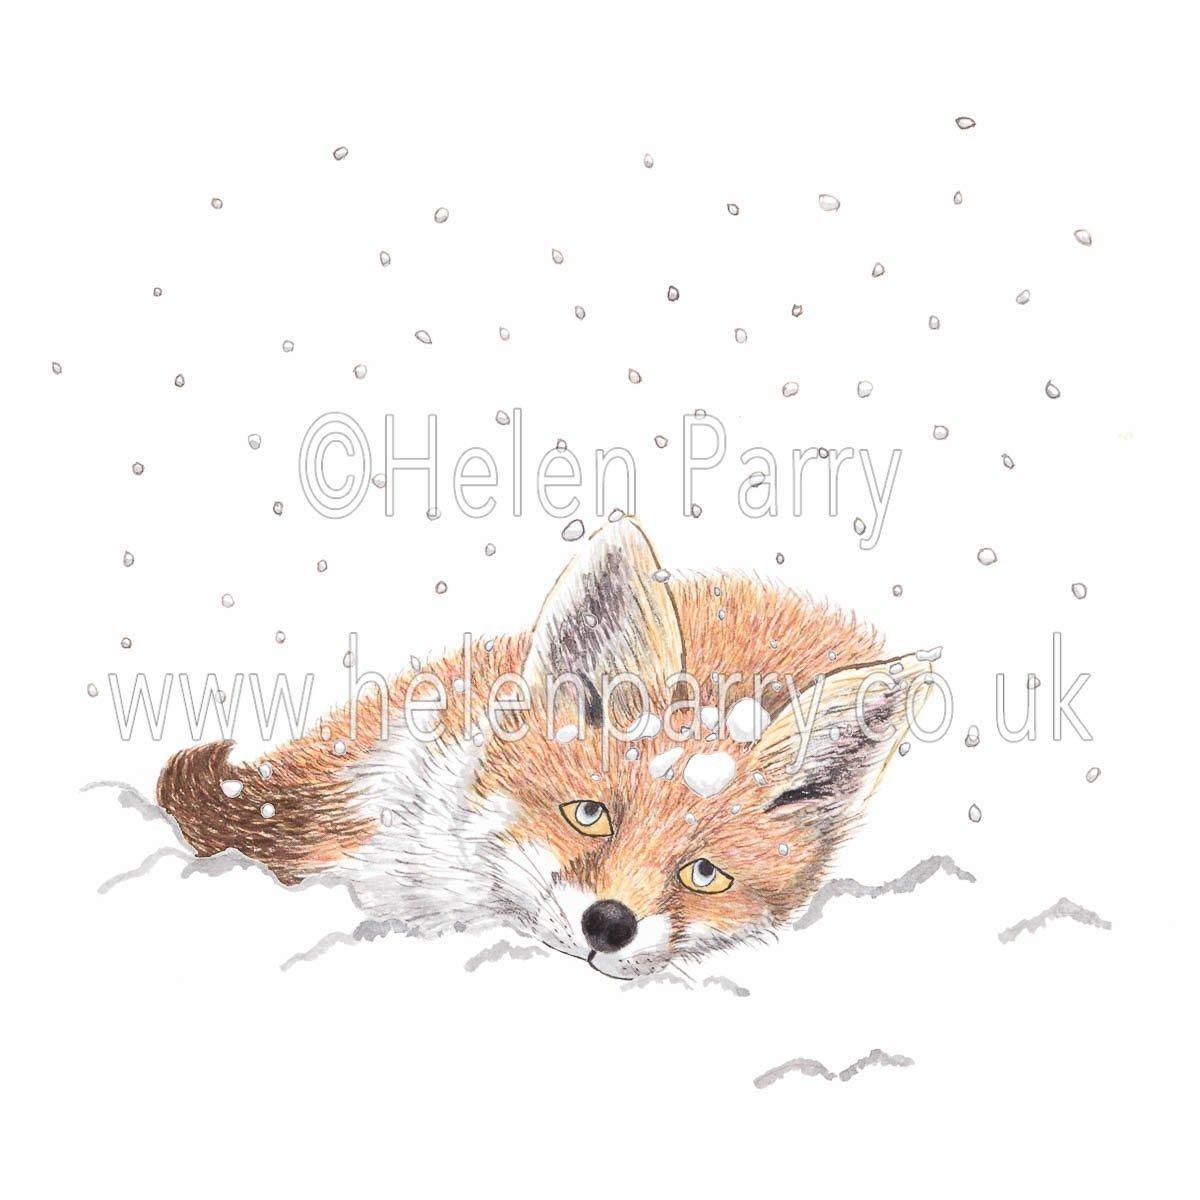 greeting card of fox in snow drifting to sleep